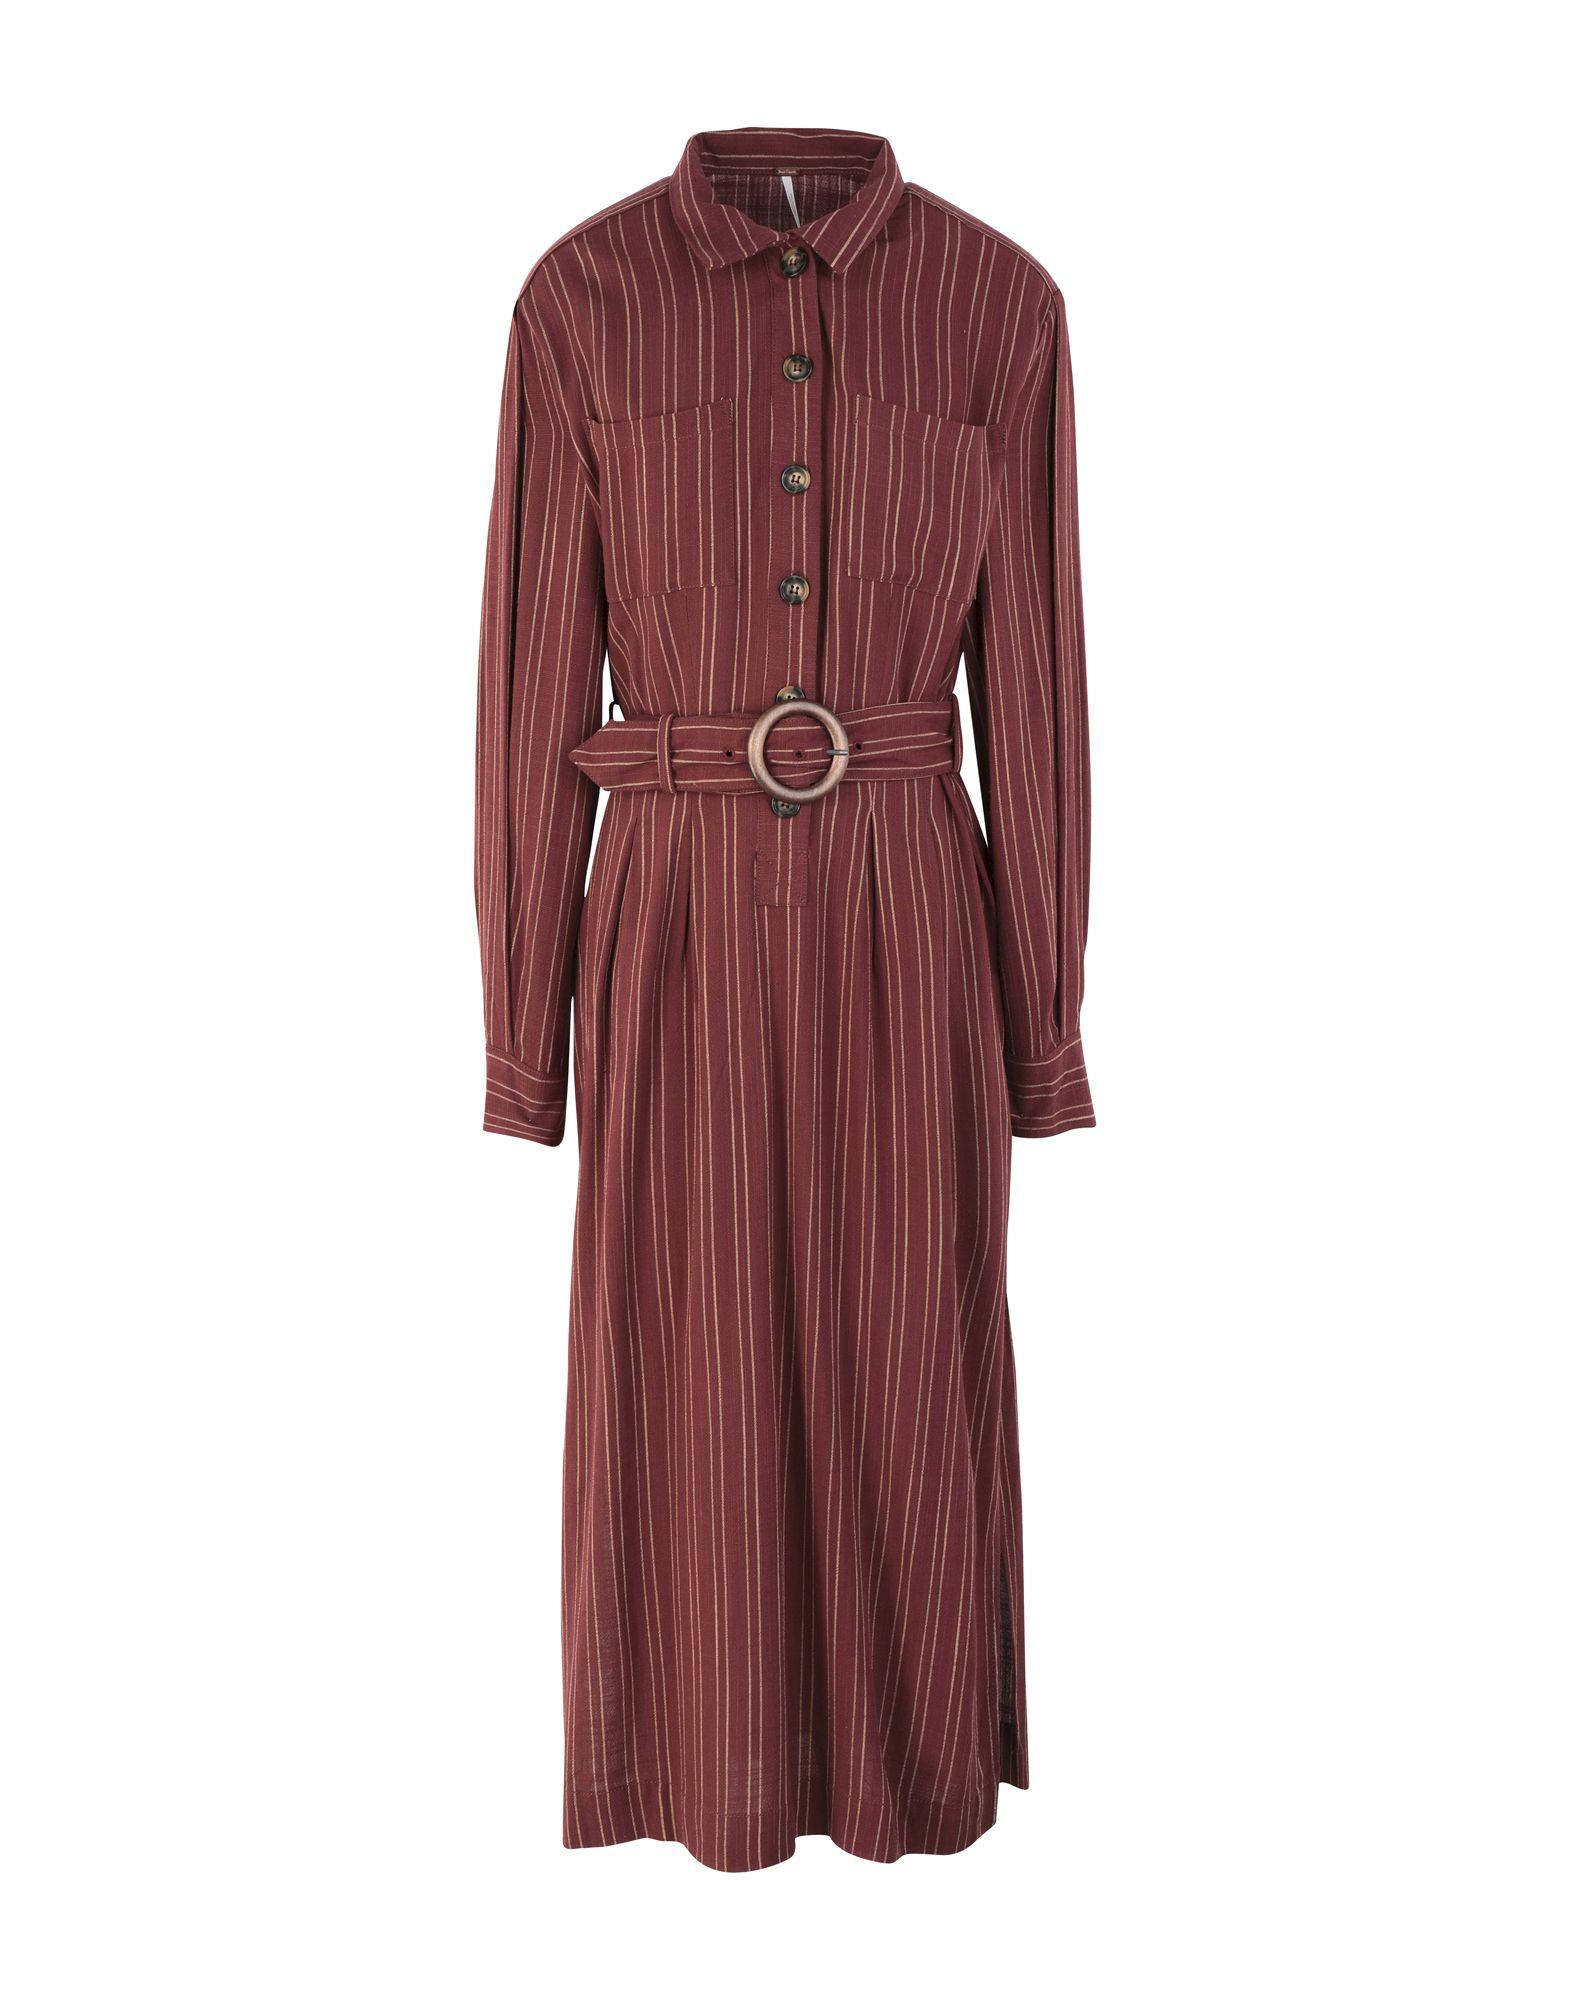 FREE PEOPLE Платье длиной 3/4 free people платье длиной 3 4